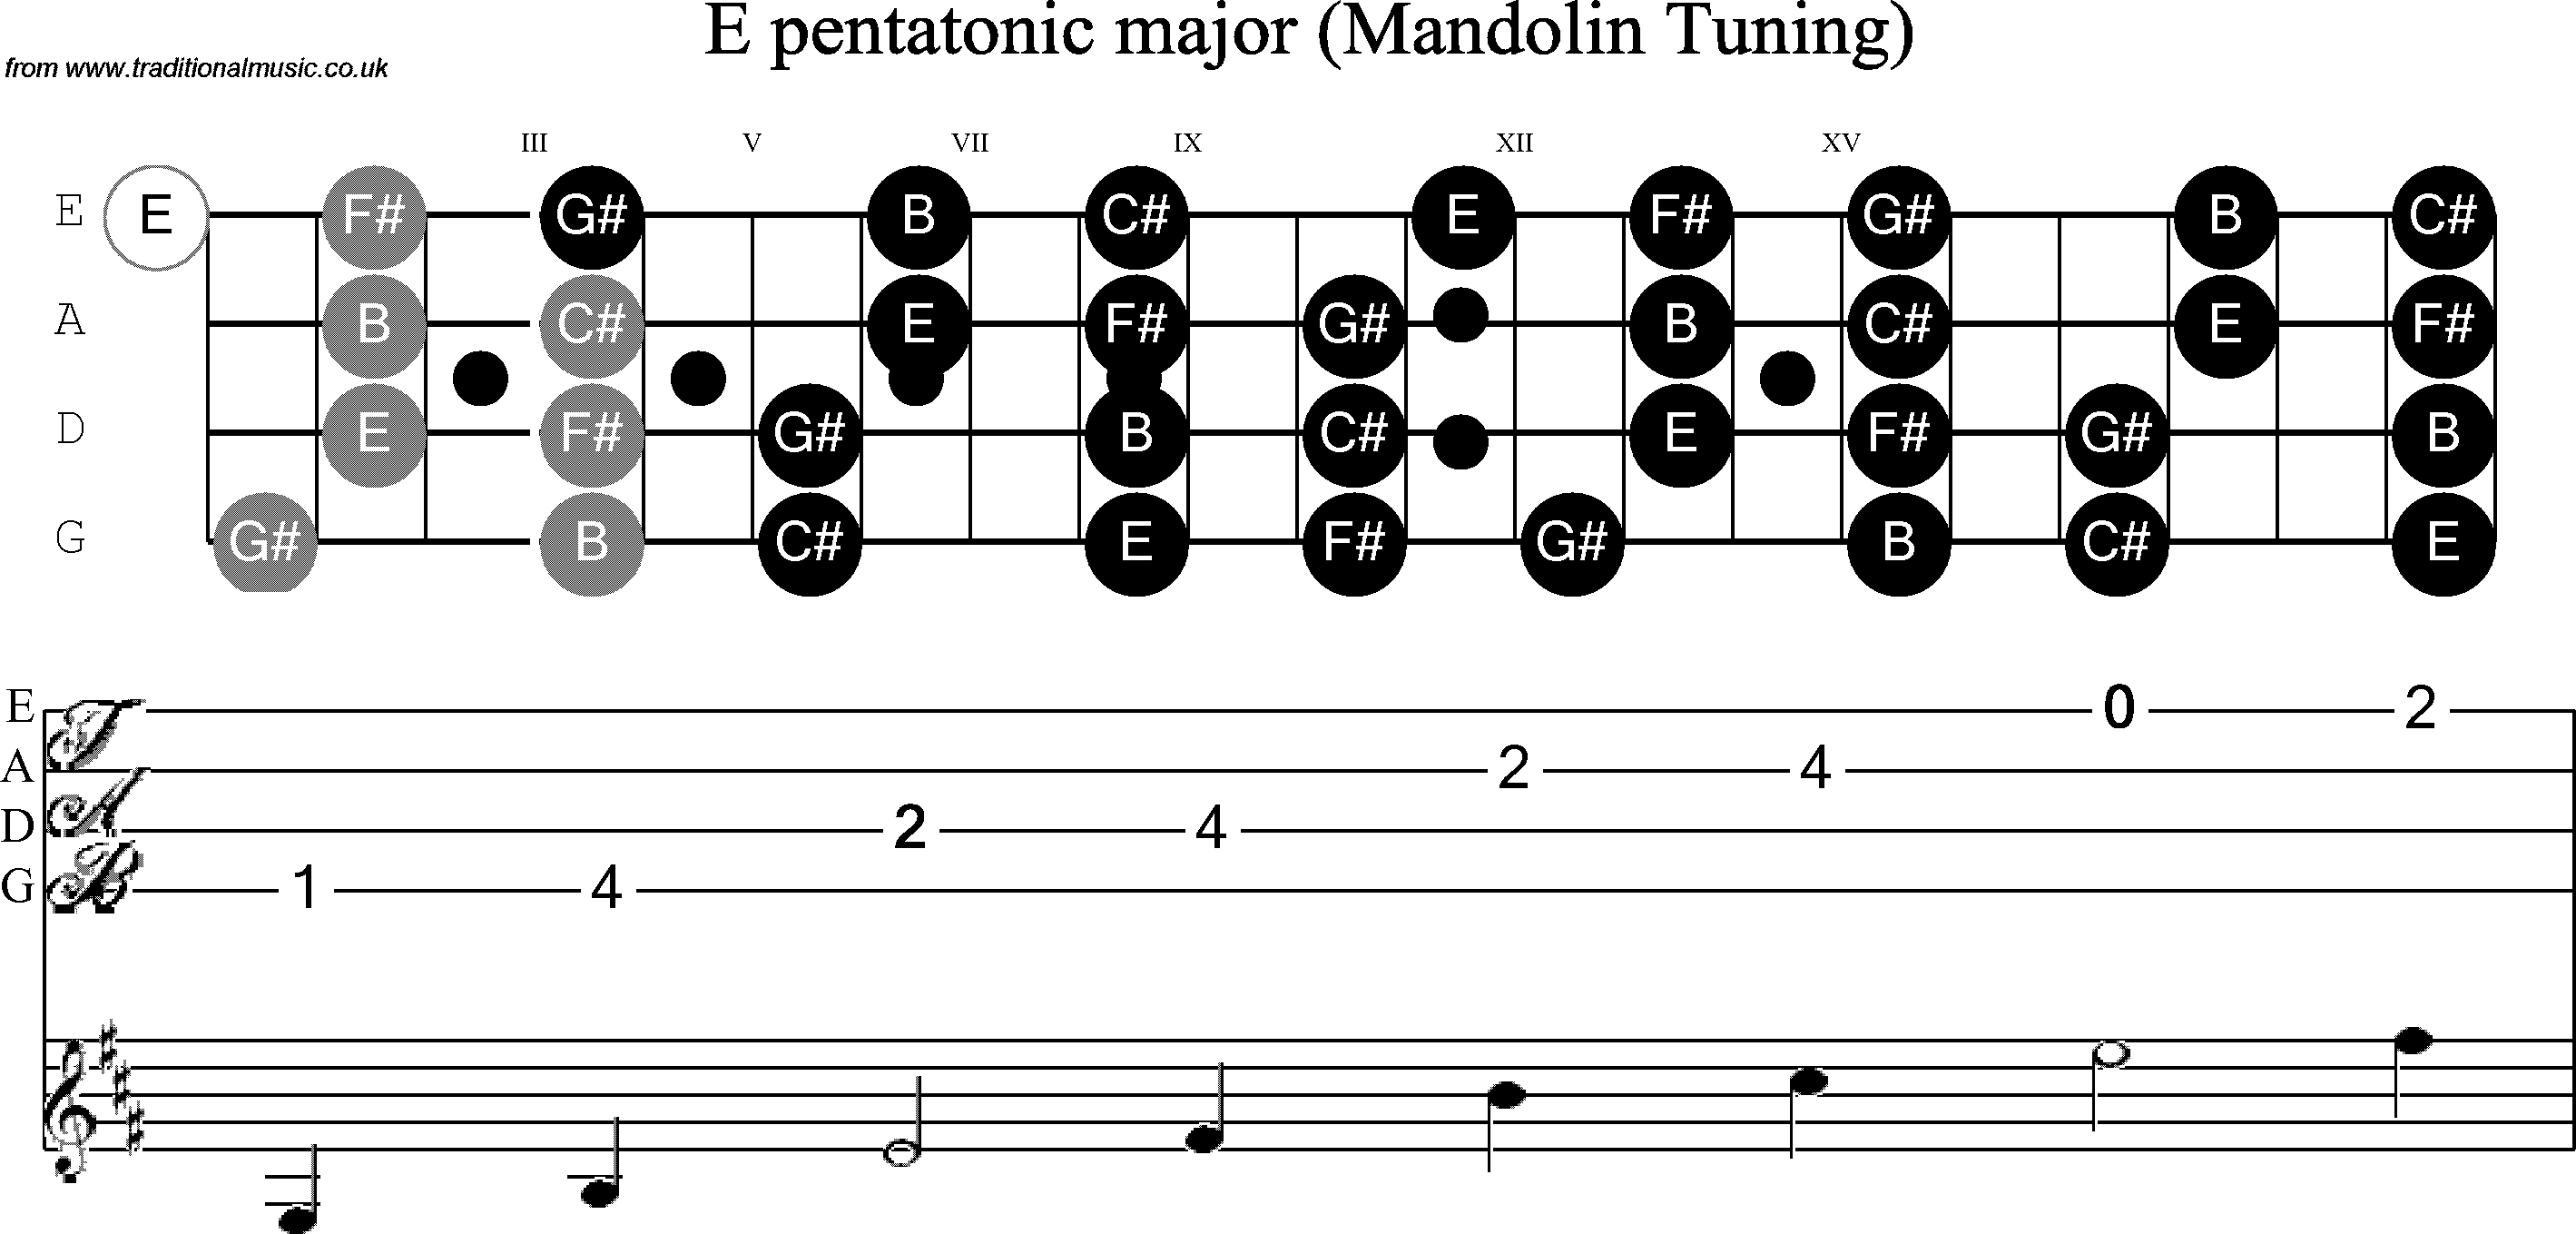 bass neck diagram toyota land cruiser prado 120 wiring e pentatonic scale stave and for mandolin